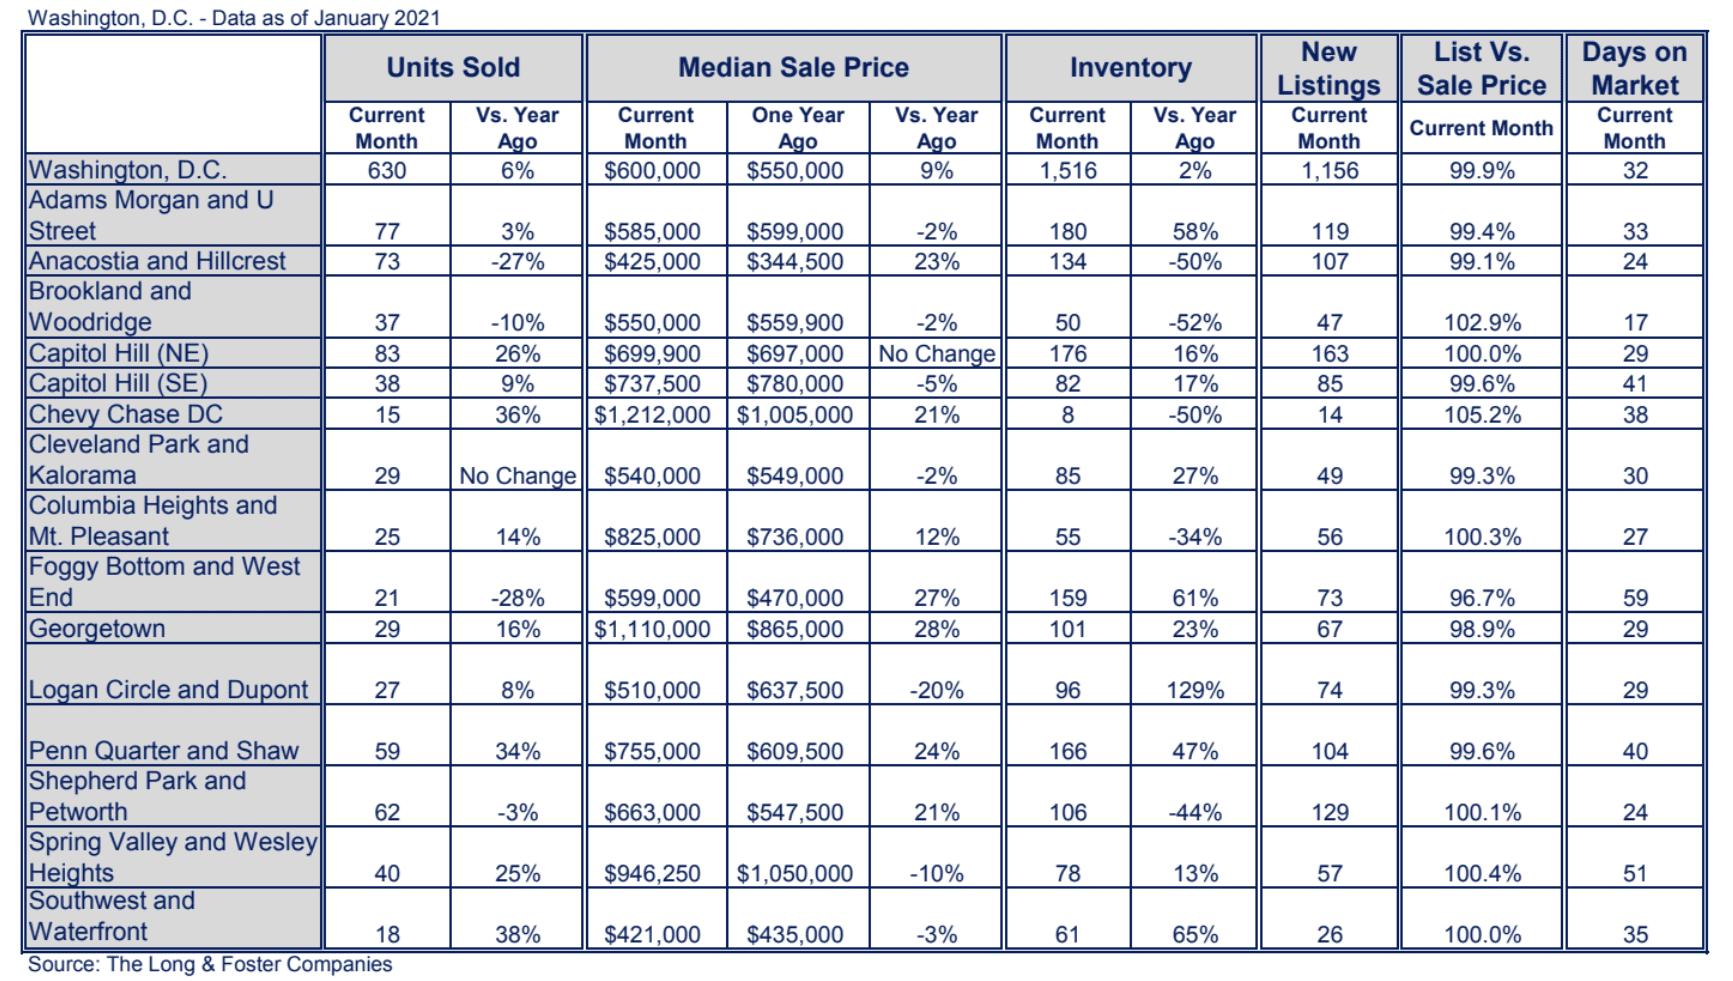 Washington, D.C. Market Minute Chart January 2021